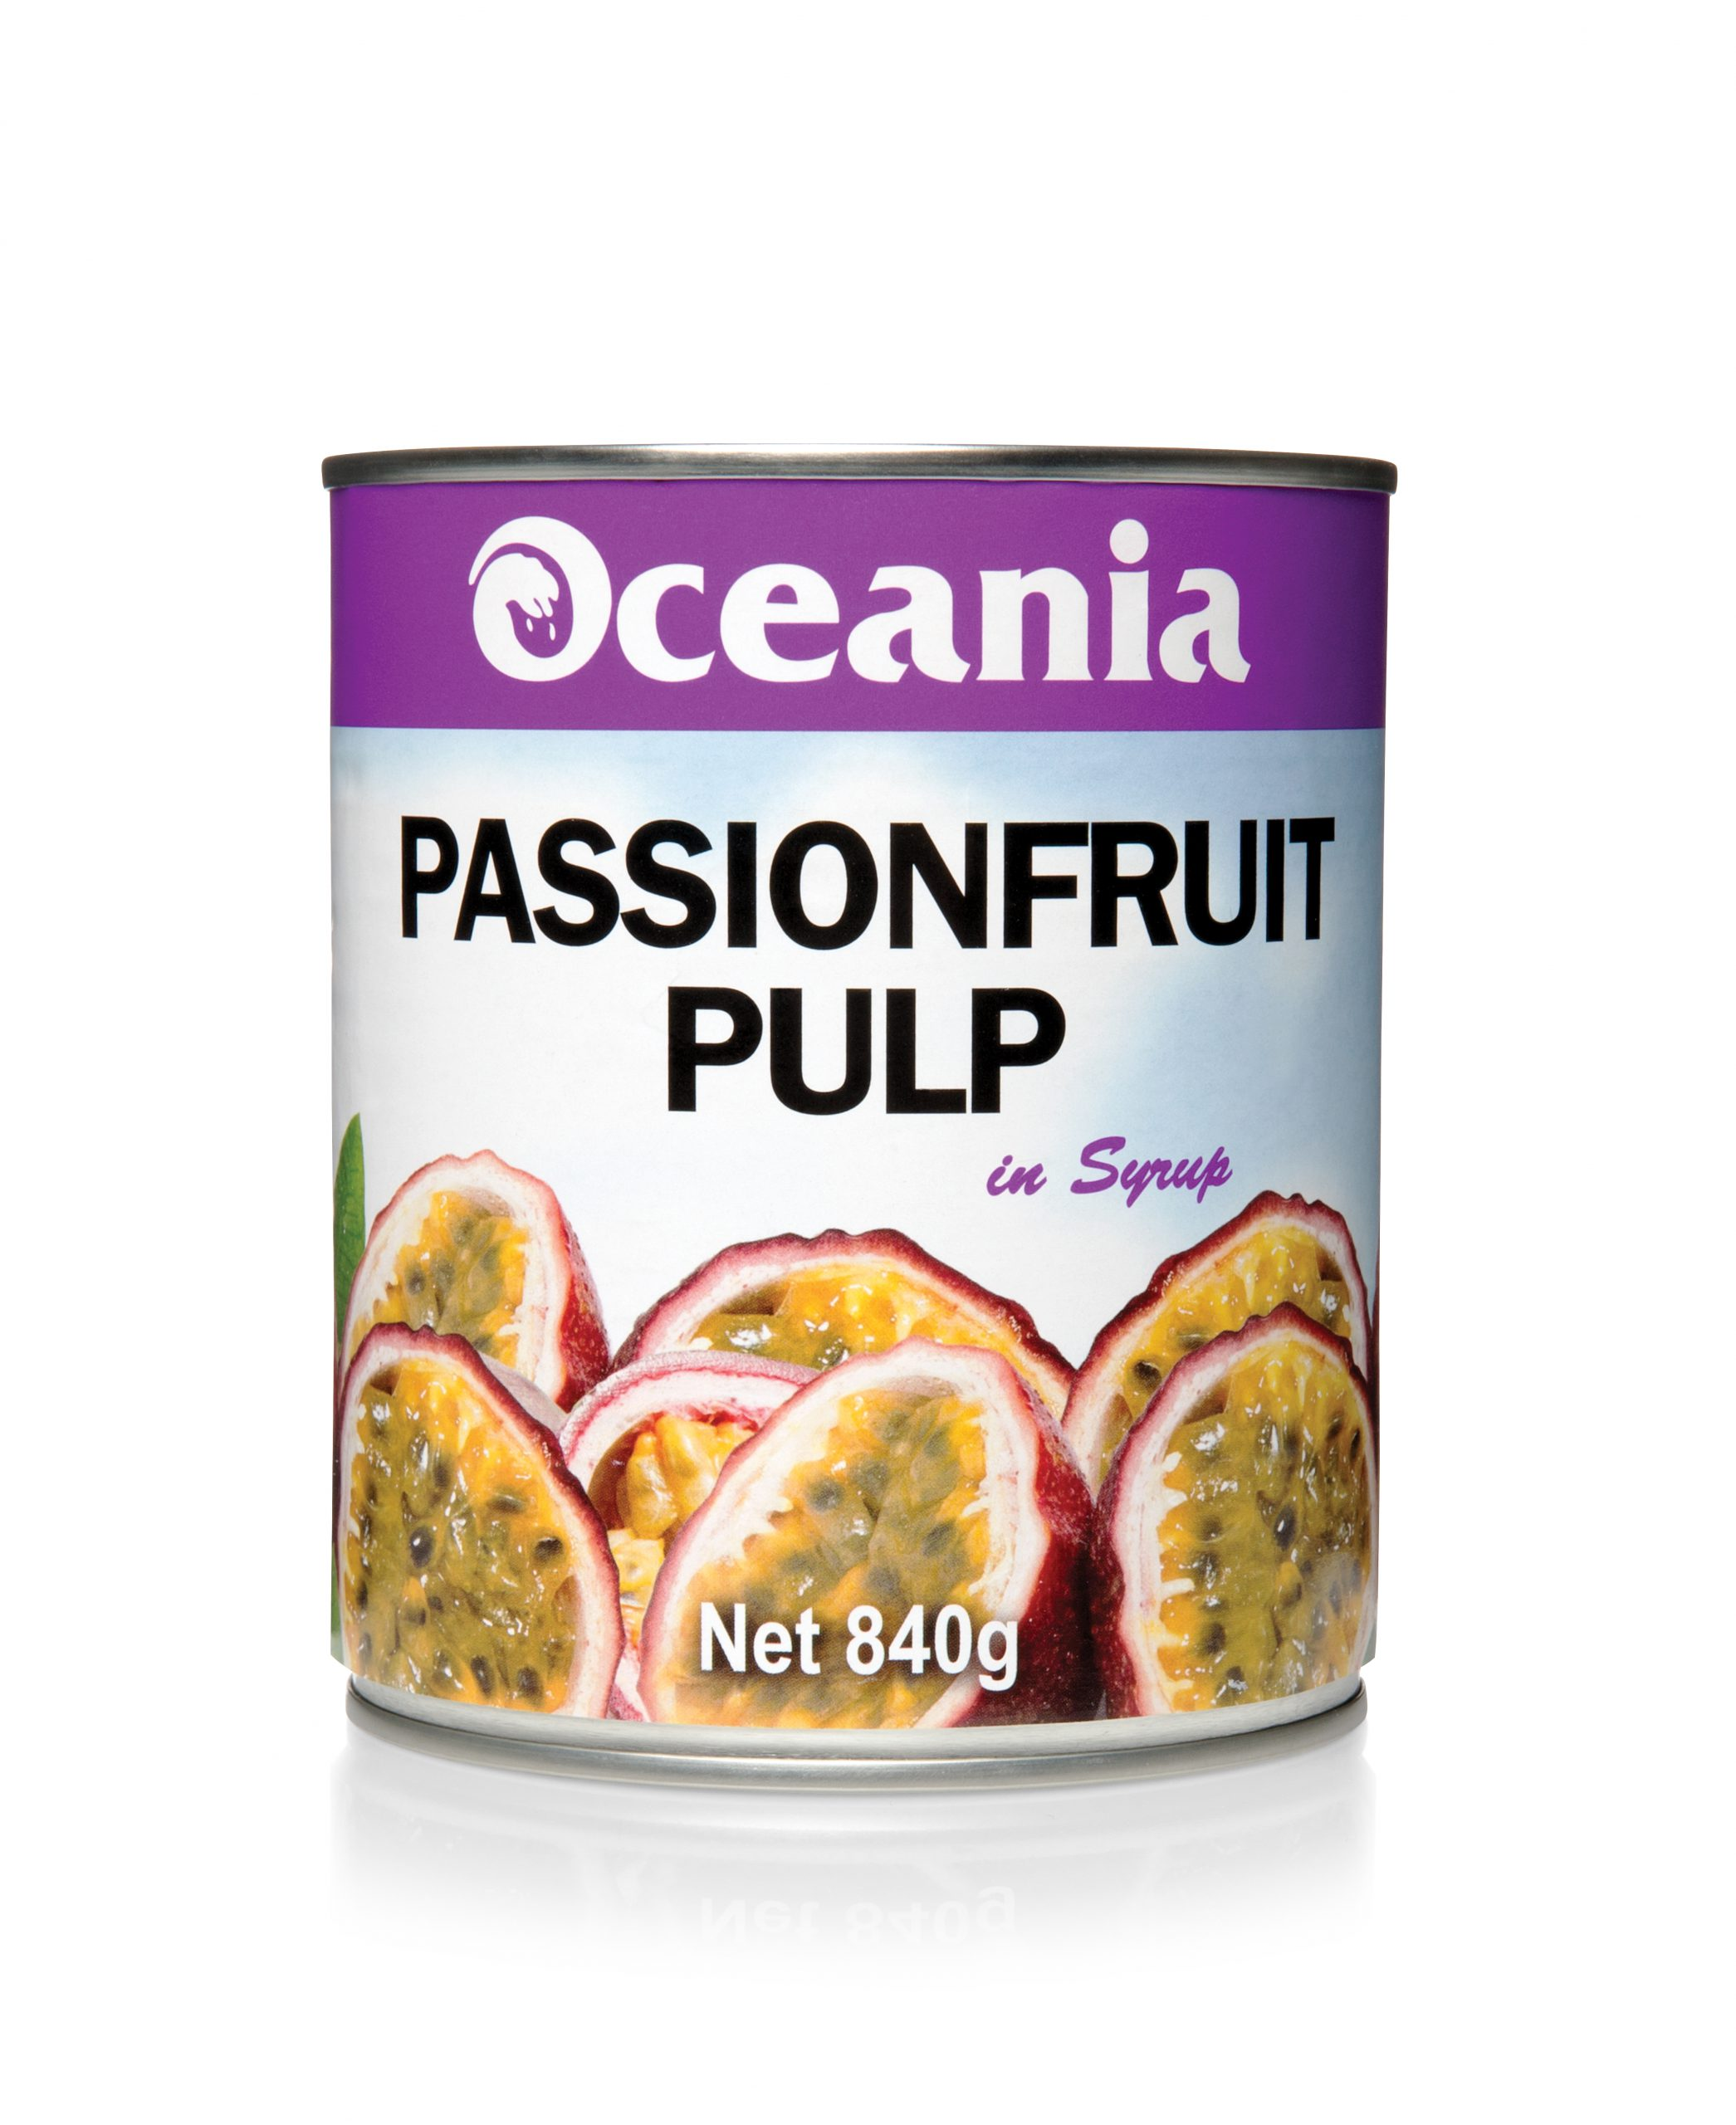 Passionfruit Pulp